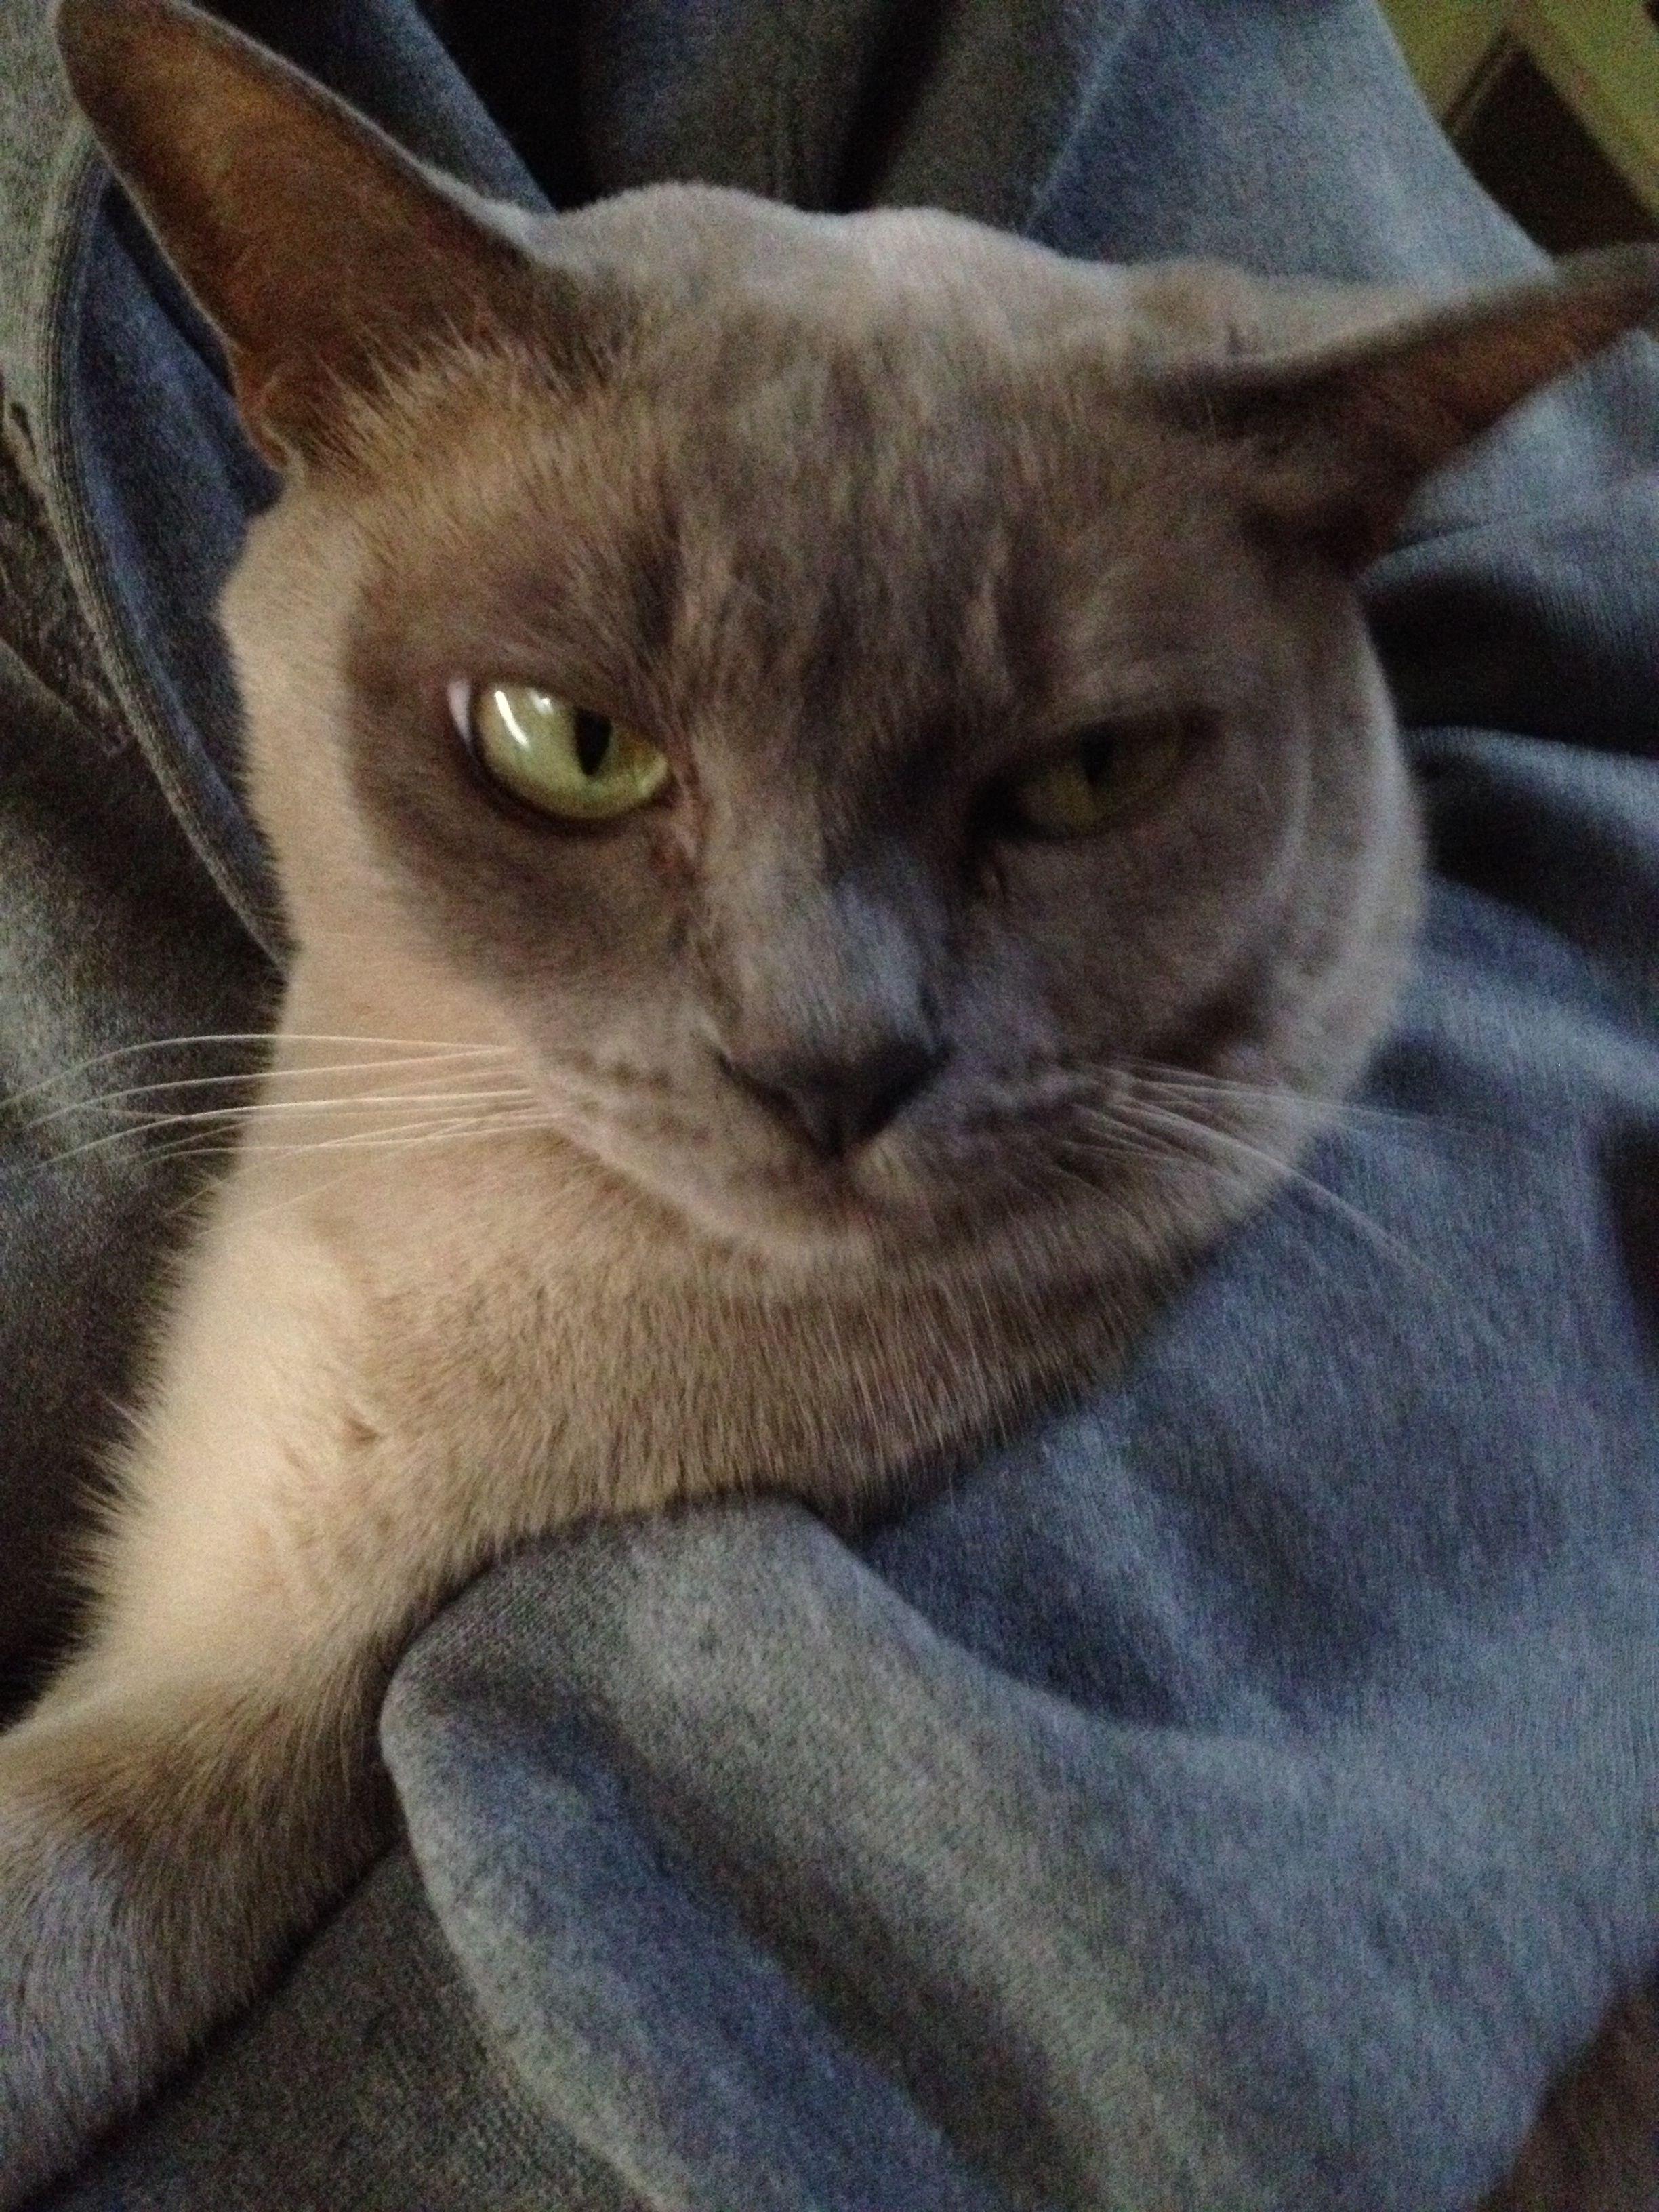 Our Burmese cat, Princess Crystal Pickle Burmese cat